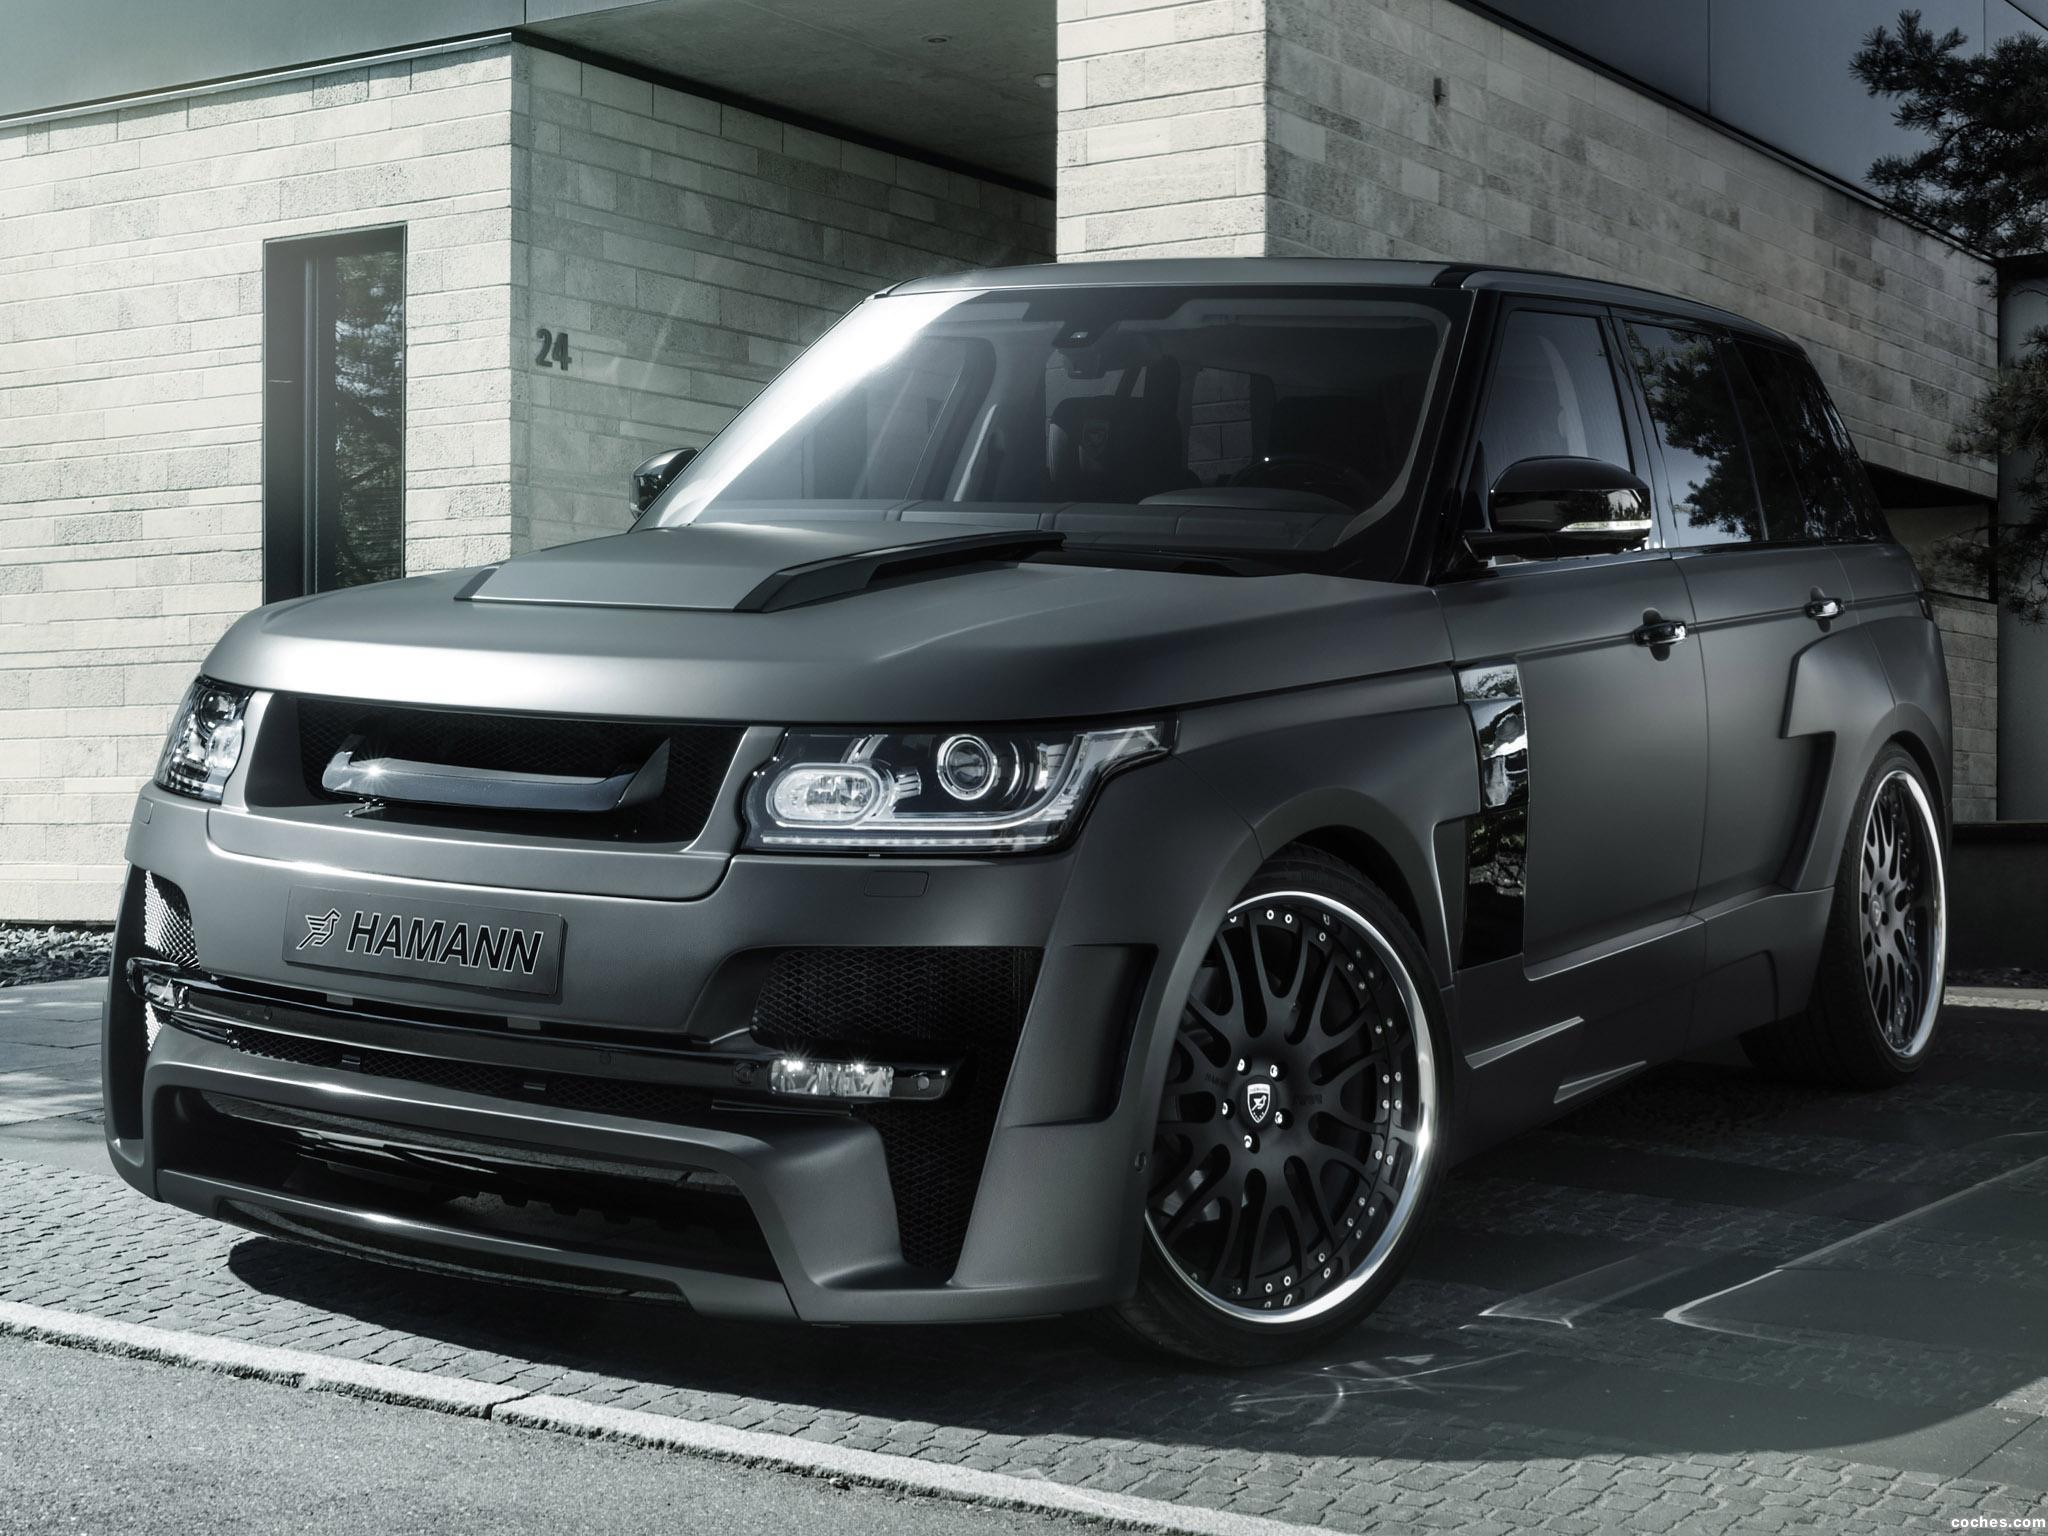 Foto 0 de Hamann Land Rover Range Rover Mystere 2013